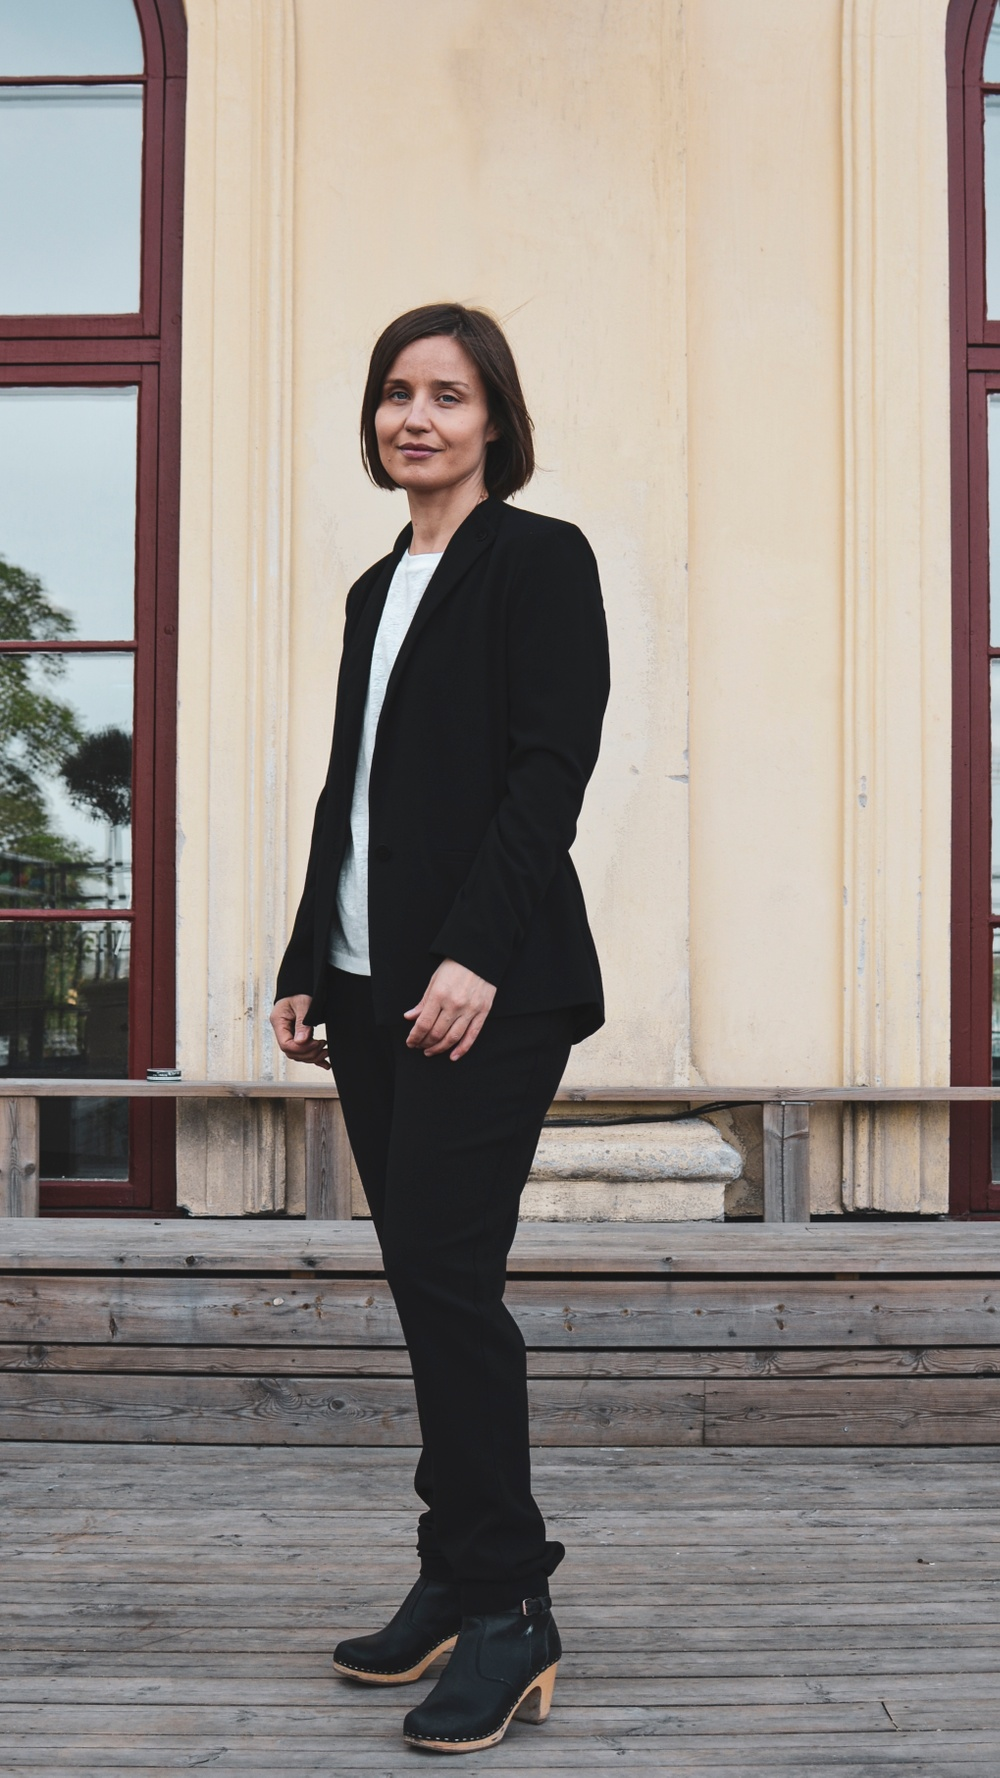 20/8 Karin Ström (HI-TECH HOES) Sommar 2019 i Champagnebaren, Södra Teatern Foto: Karin Bernhardsson